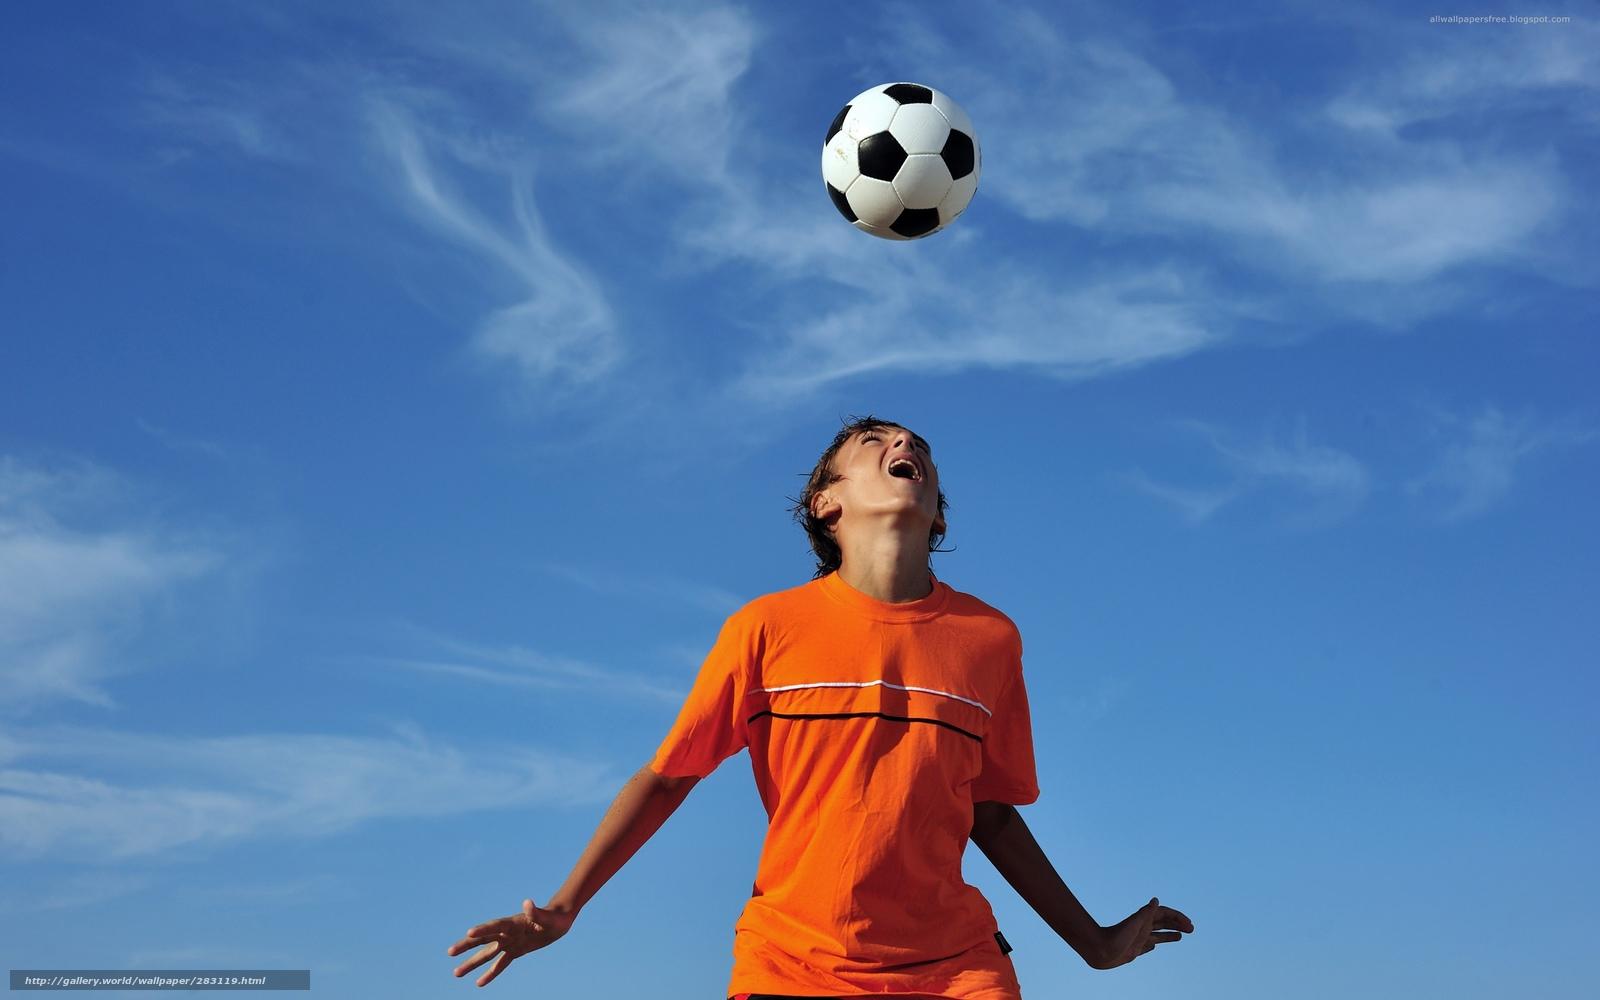 Soccer wallpaper hd 2014